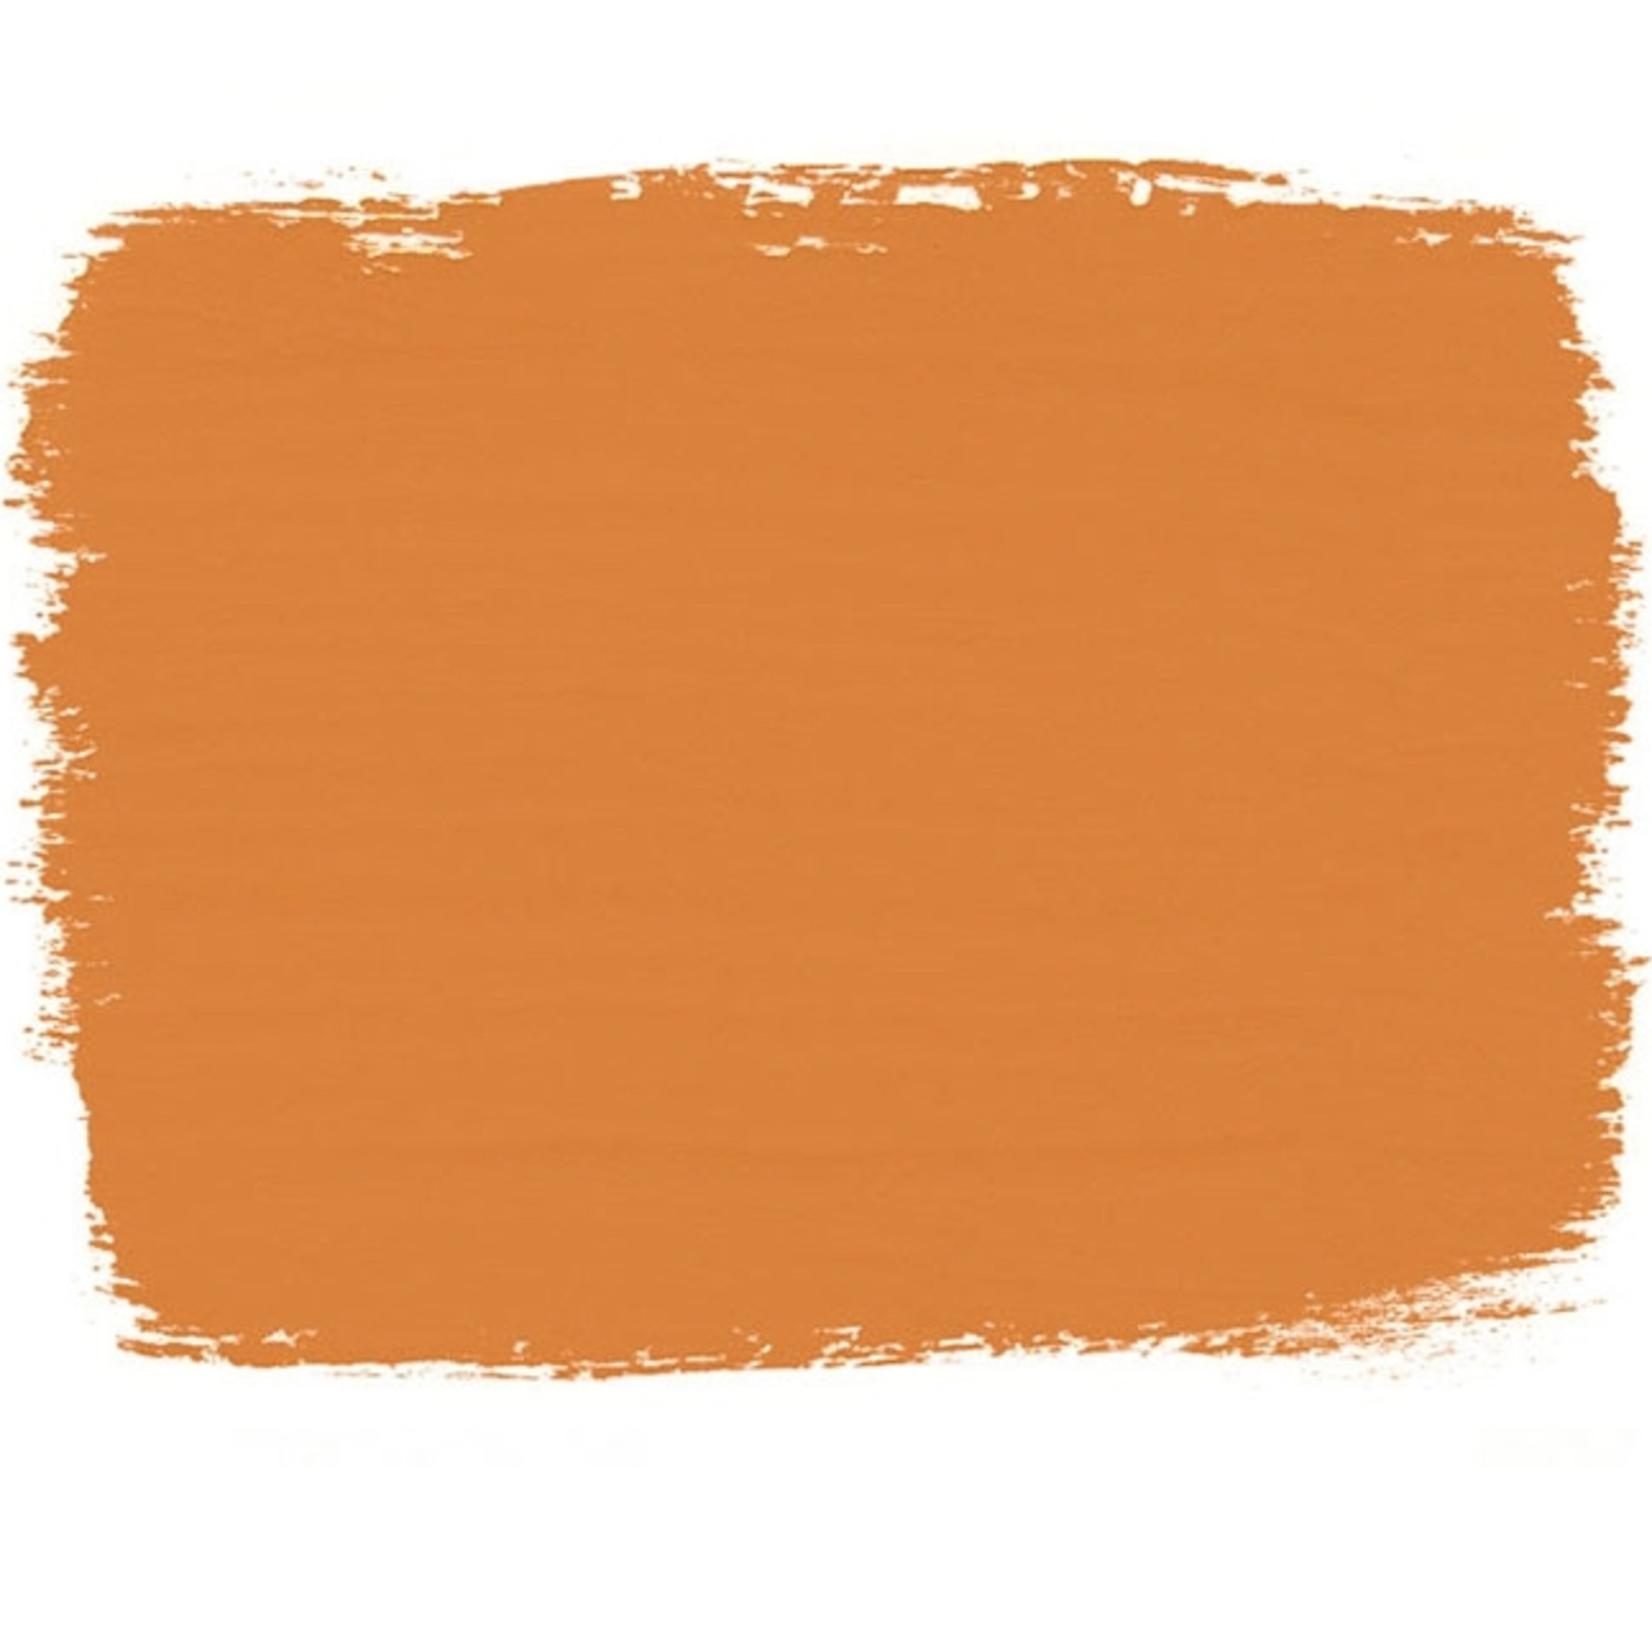 Annie Sloan Annie Sloan Barcelona Orange 120ml Chalk Paint